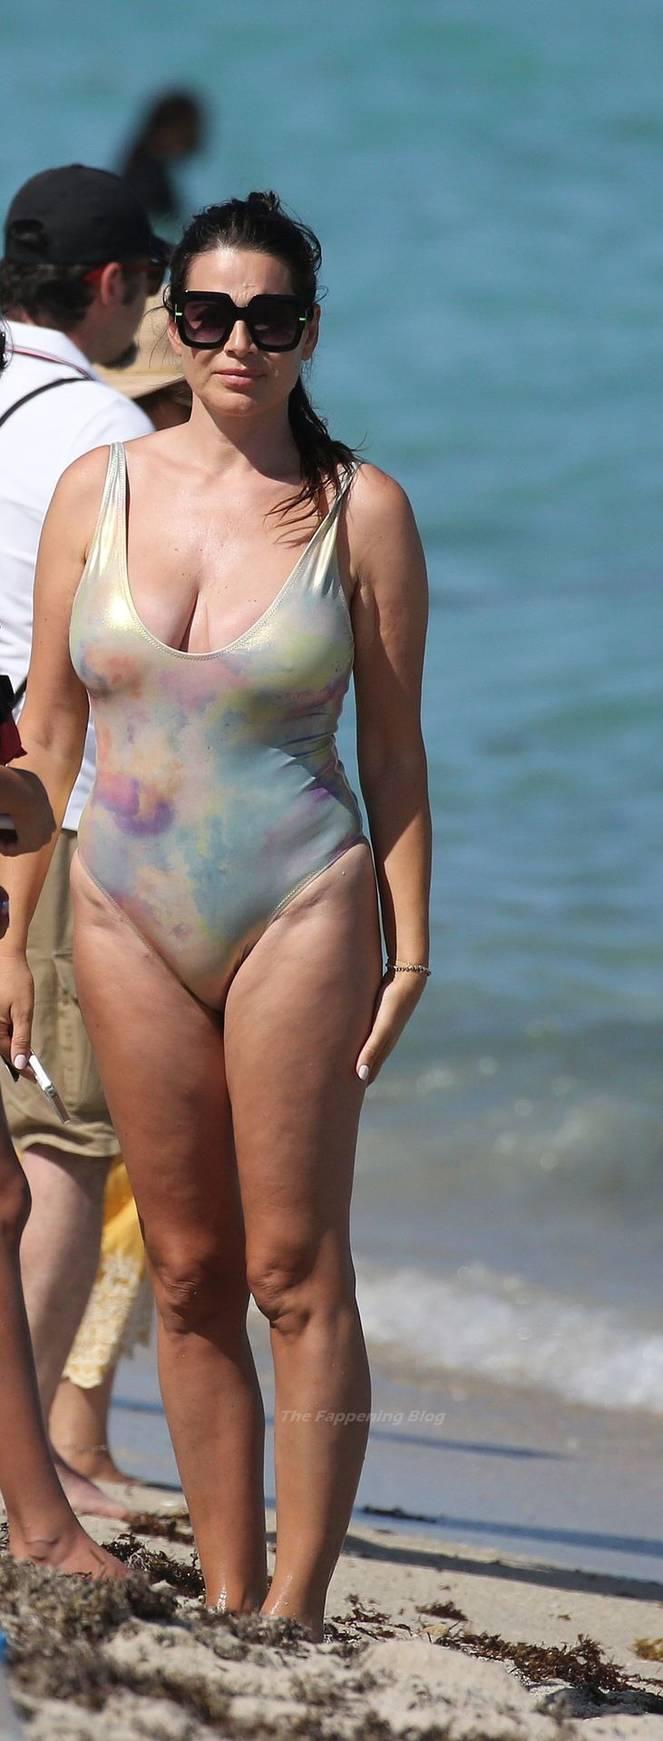 Sonia Amoruso on Beach 42